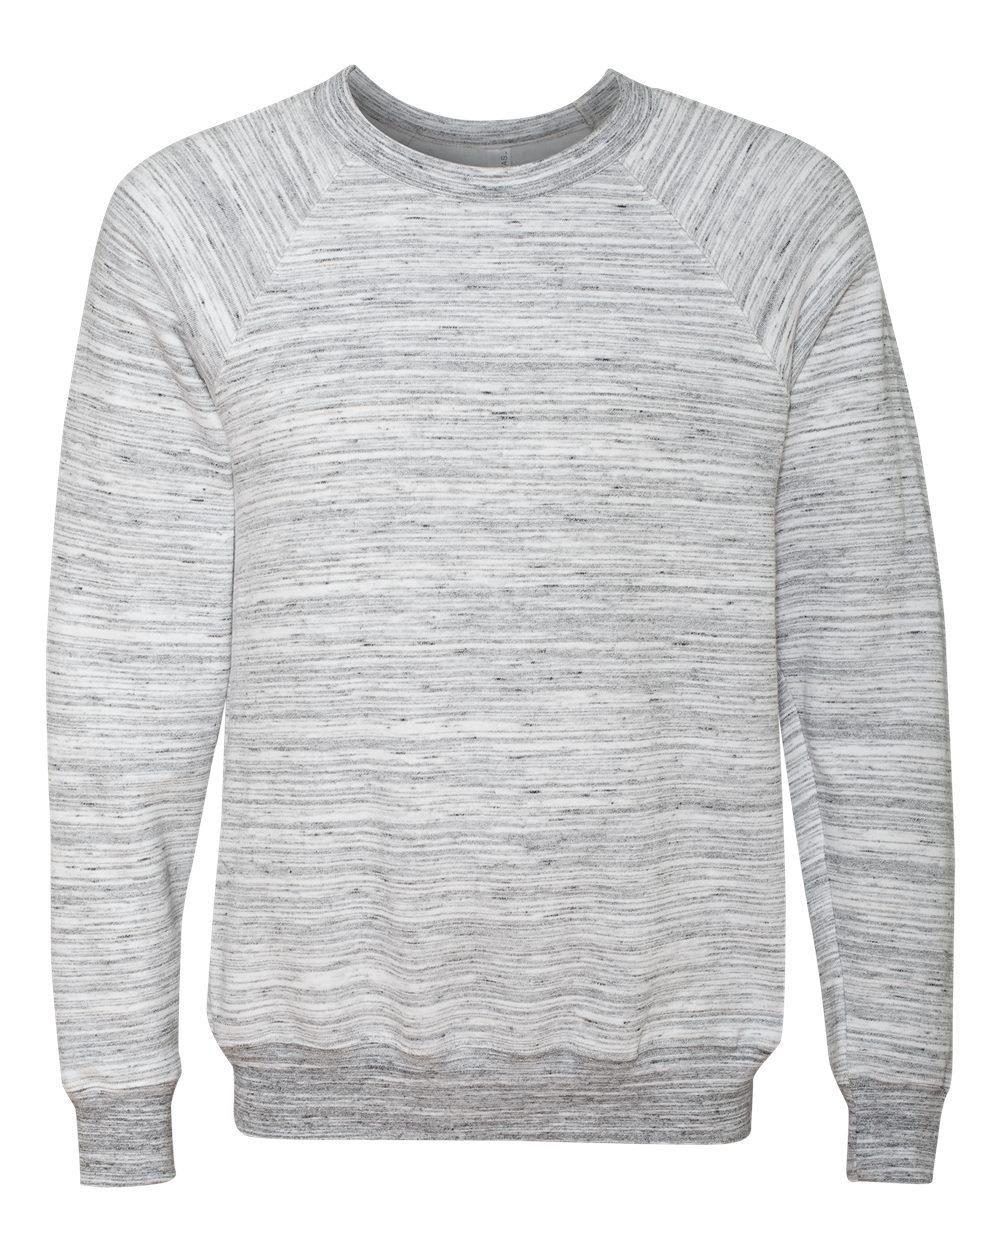 Bella-Canvas-Unisex-Sponge-Fleece-Crewneck-Sweatshirt-Top-Blank-3901-up-to-2XL thumbnail 43